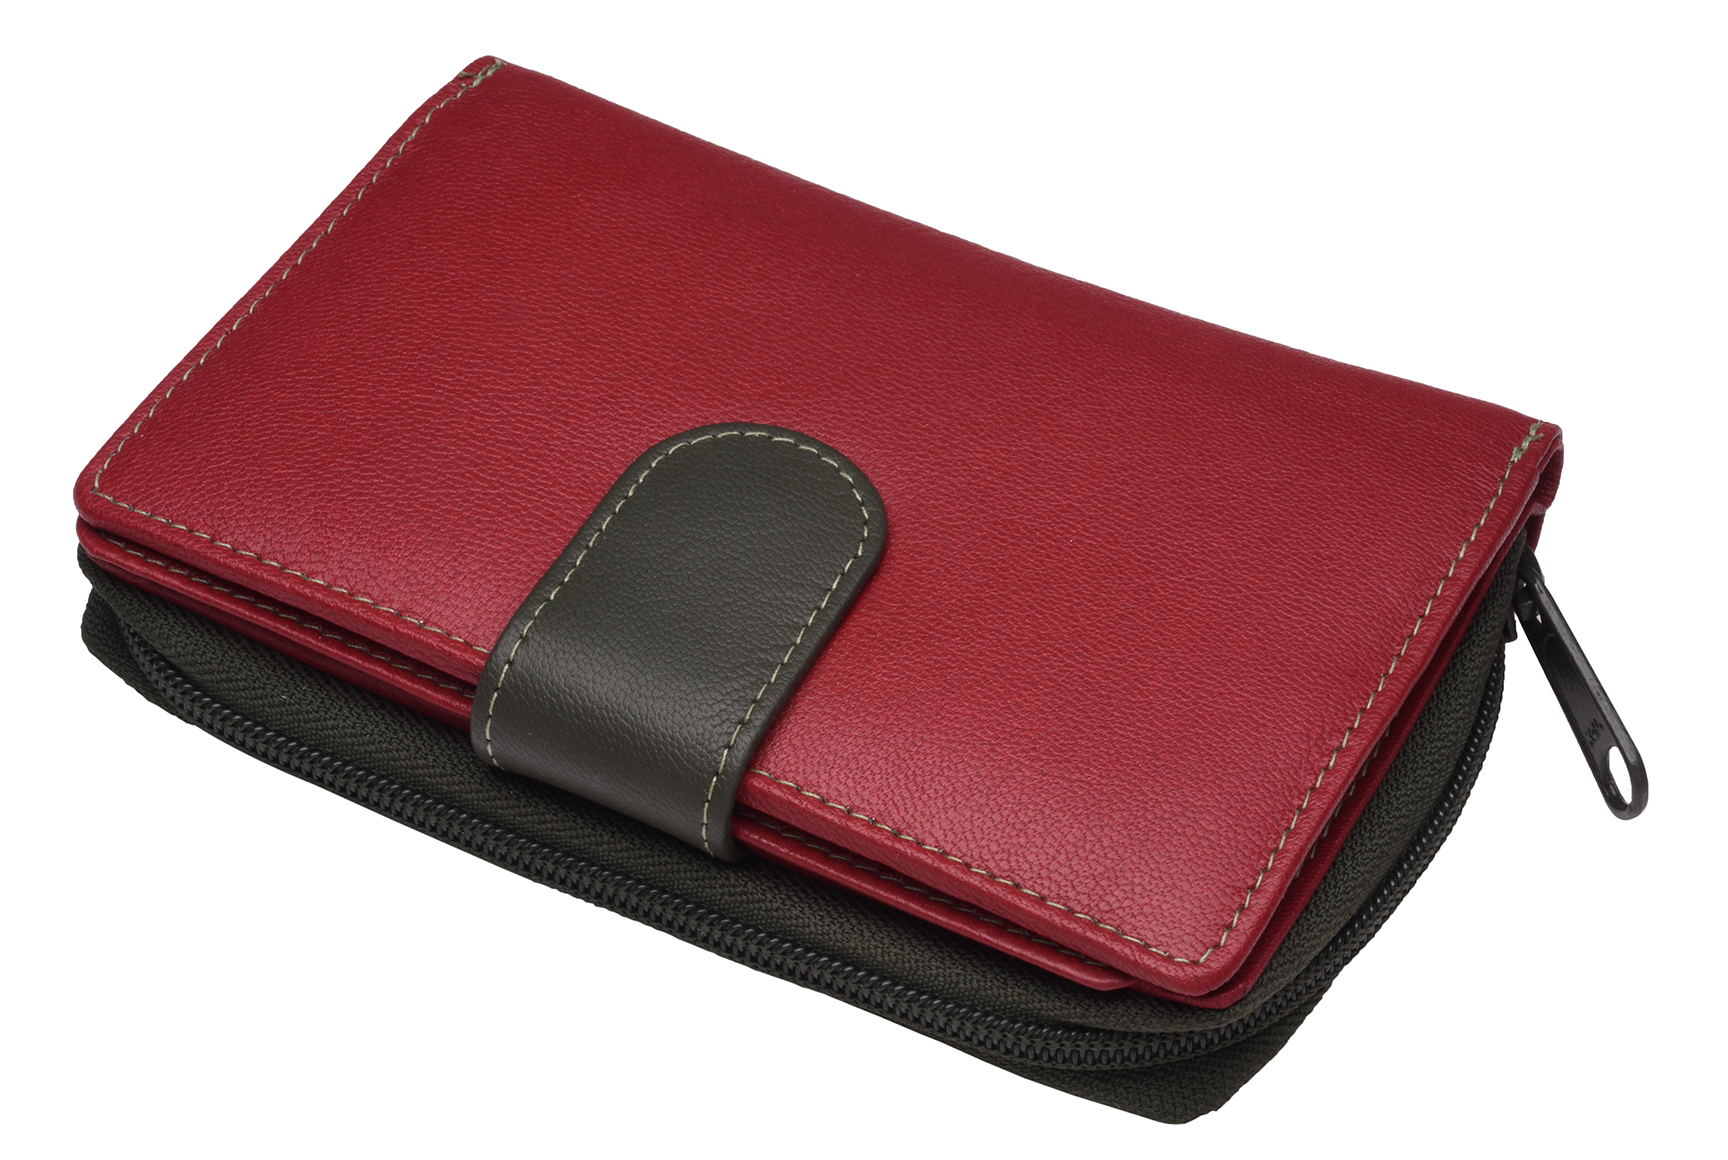 Ladies-Womens-RFID-Blocking-Safe-Leather-Bifold-Medium-Purse-Wallet-Coin-Section thumbnail 15